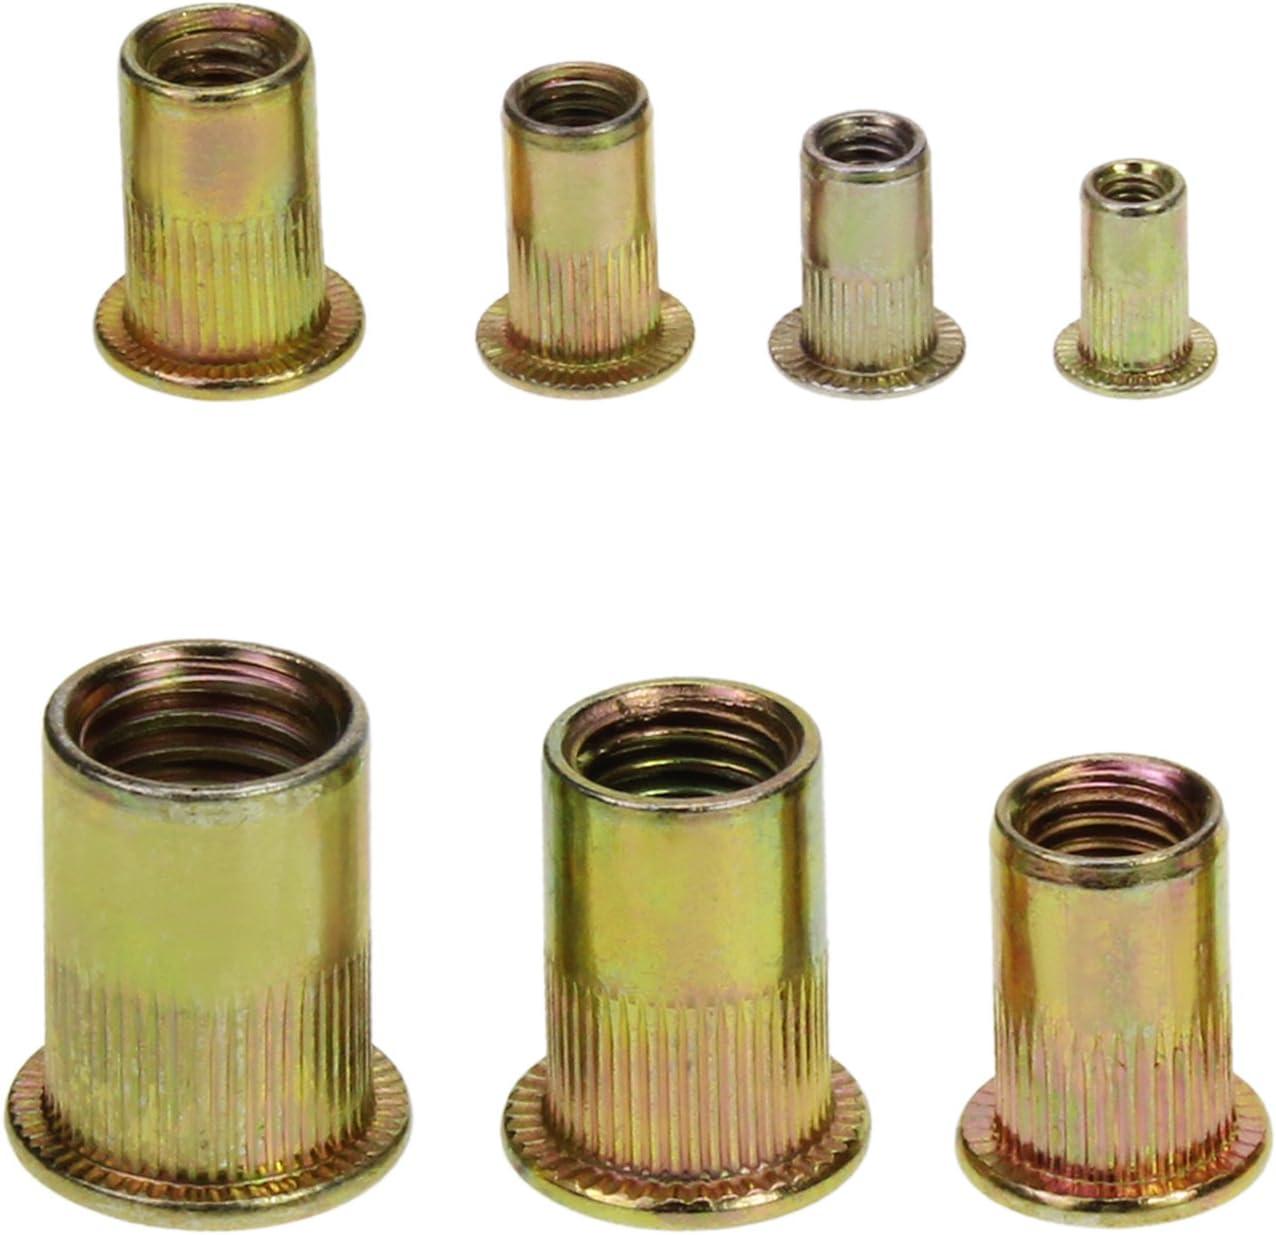 7 Types-150pcs AuSL 150PCS Yellow Zinc Plated Carbon Steel Rivet Nut M3 M4 M5 M6 M8 M10 M12 Flat Head Threaded Rivet Nutsert Cap Assortment